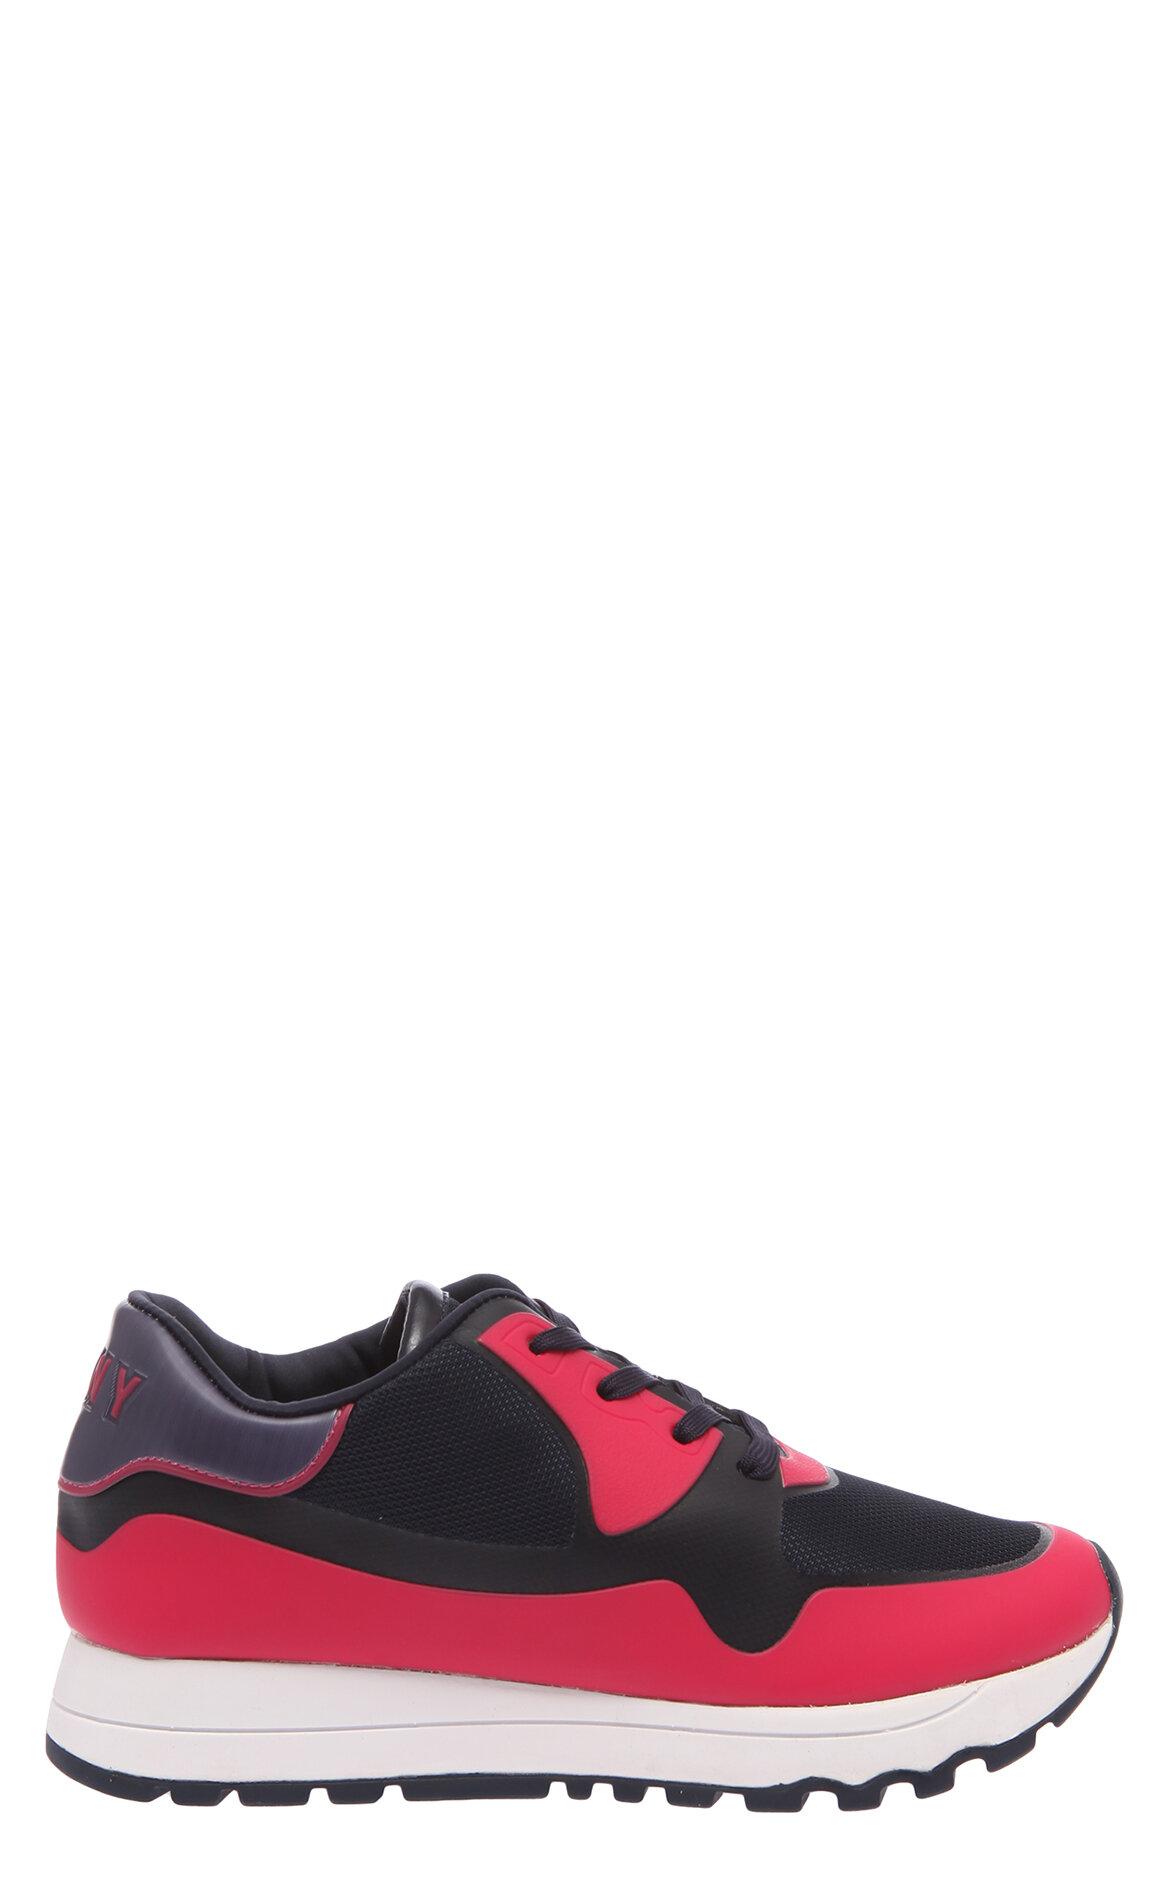 DKNY-DKNY Spor Ayakkabı